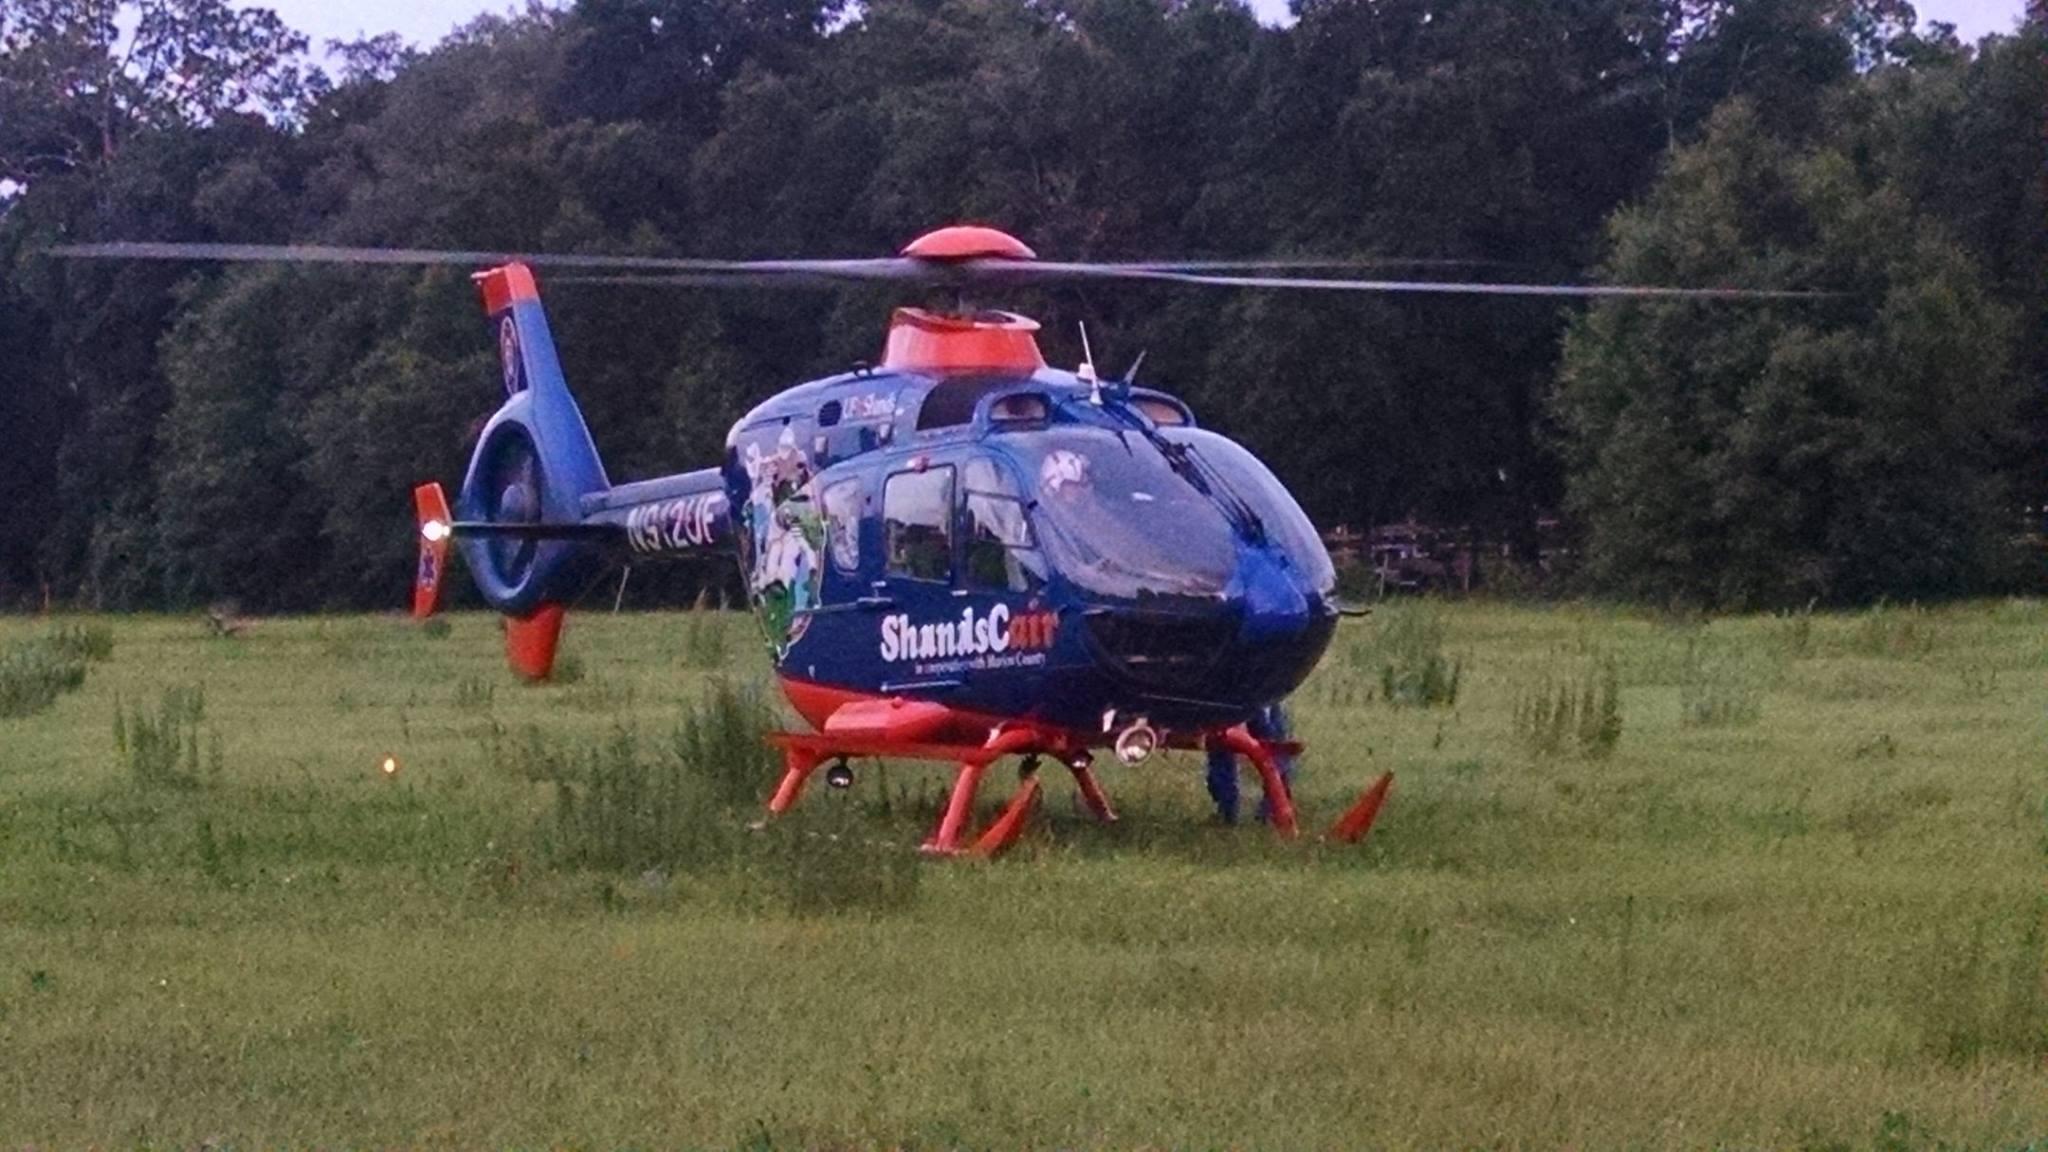 ocala news, marion ocunty news, car crash, speeding, shandscair, Man airlifted after crash near Candler